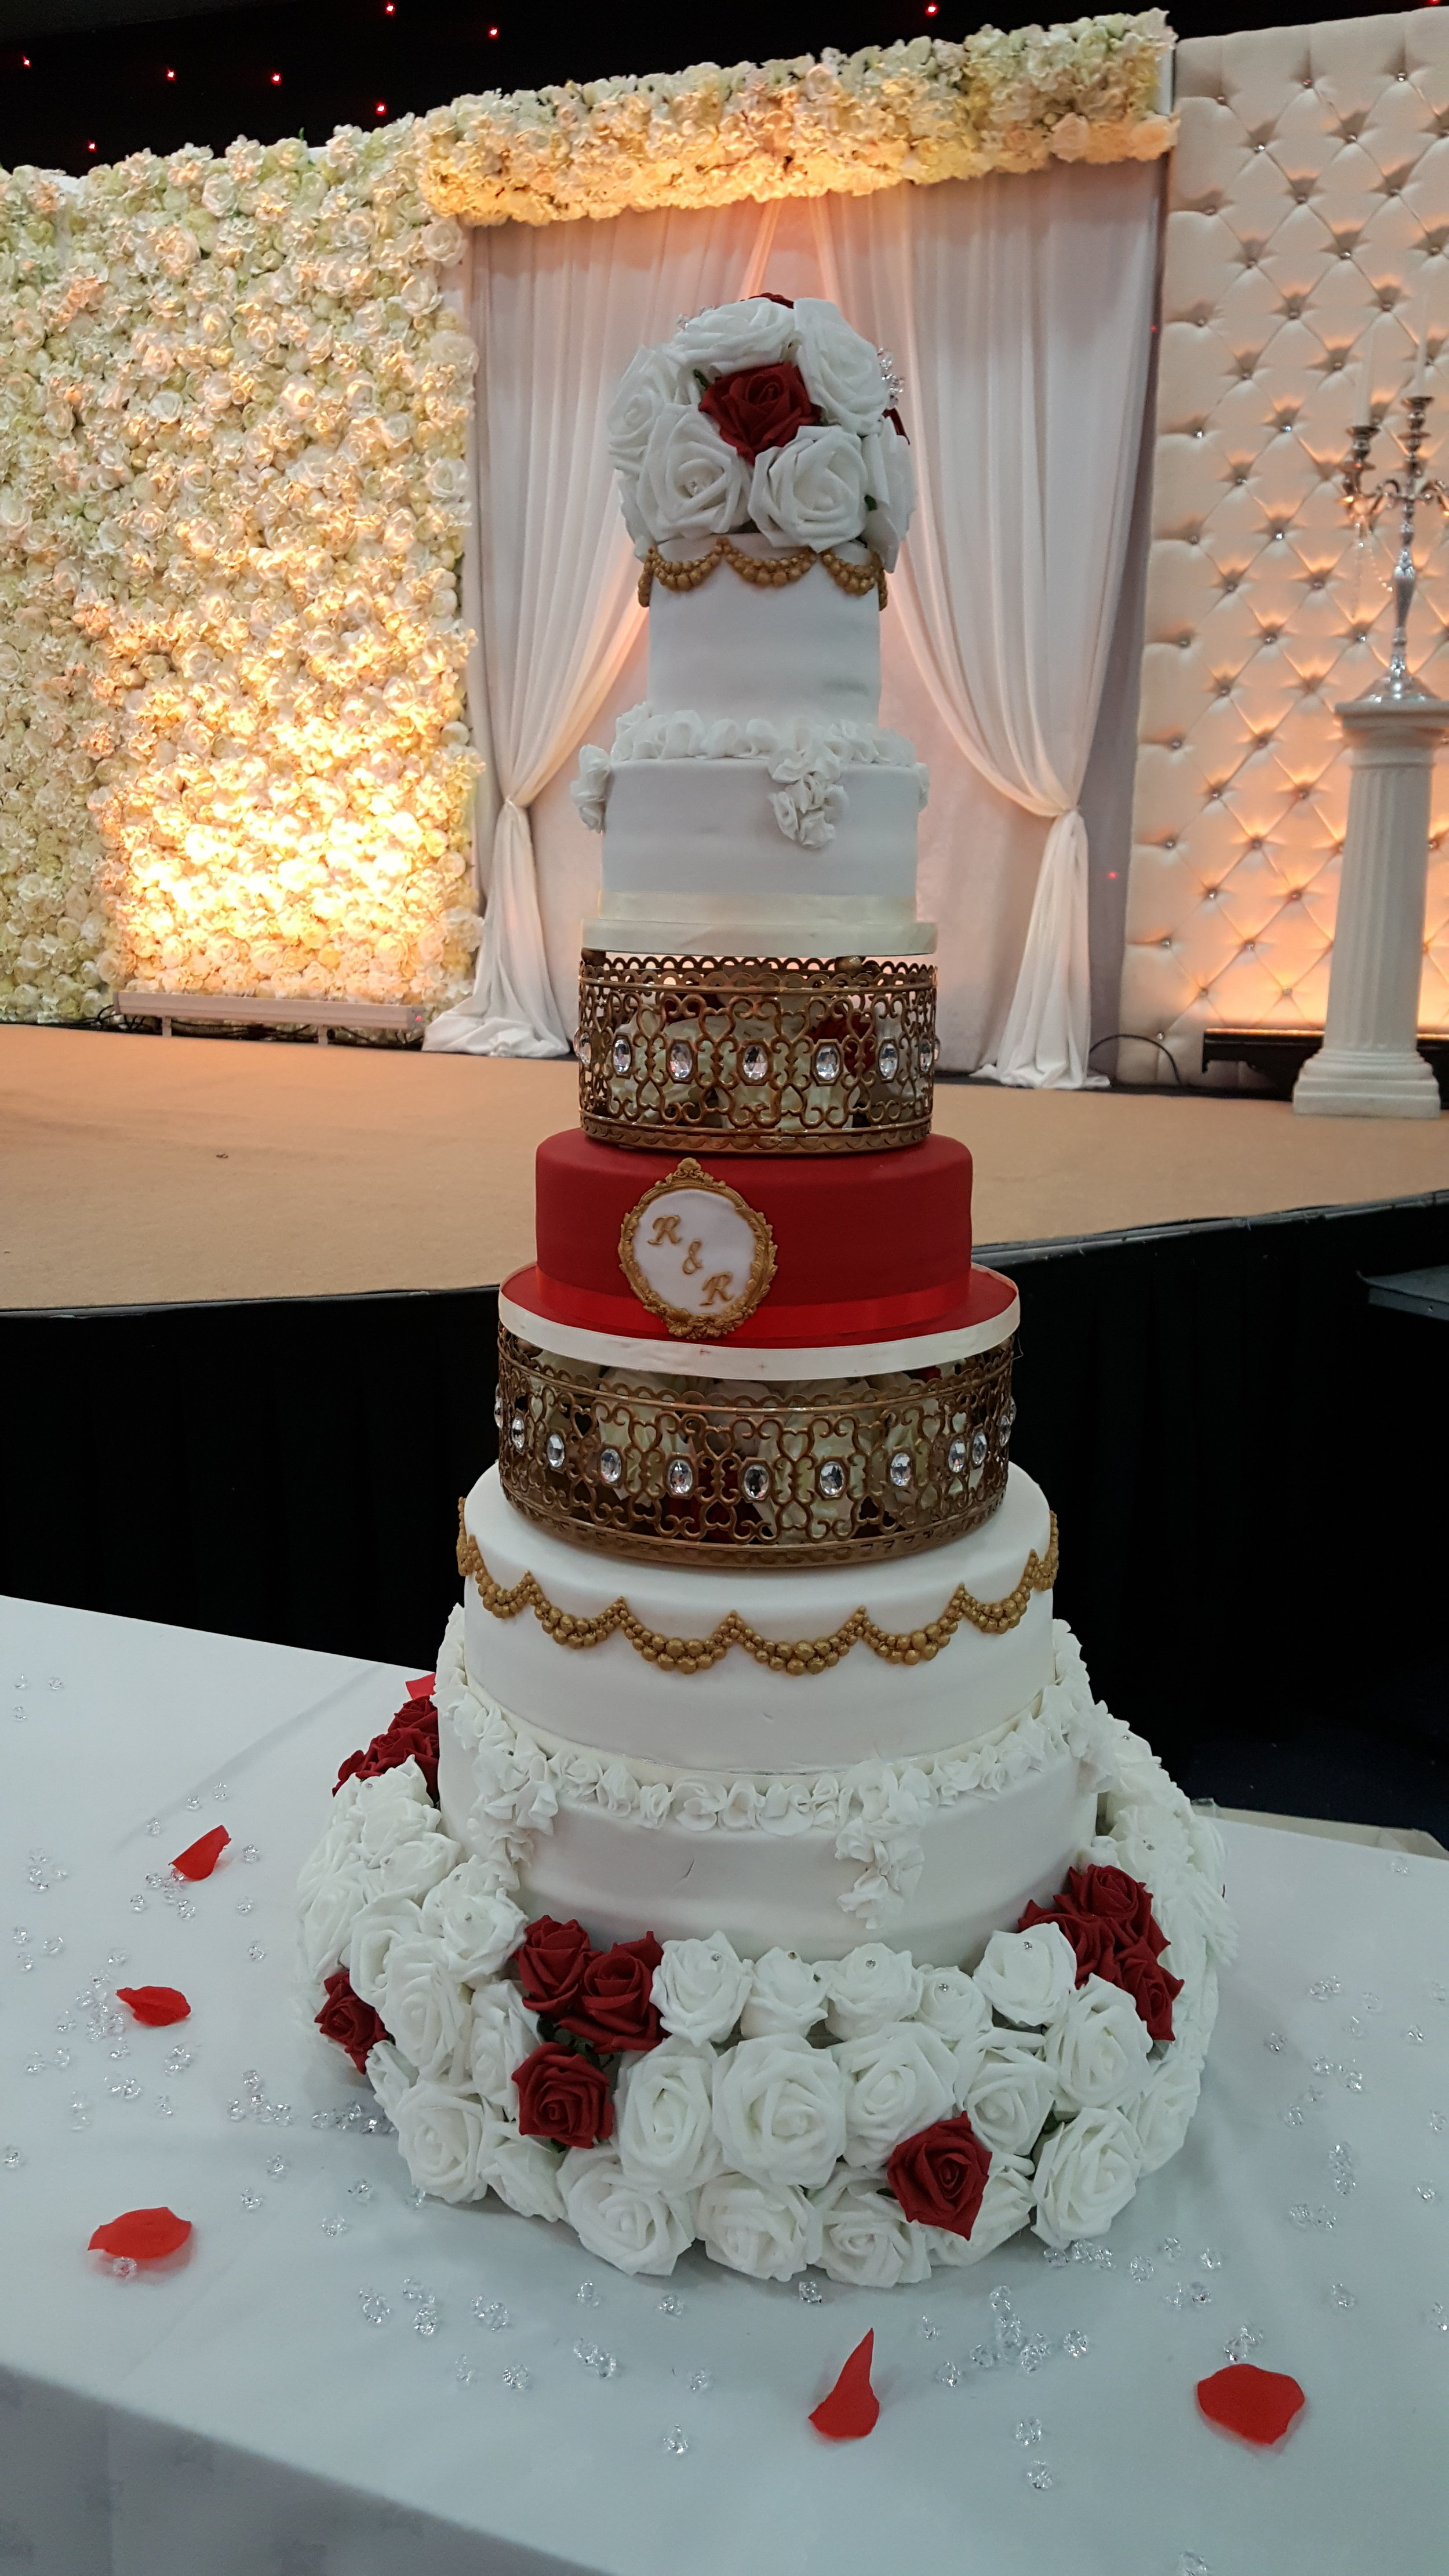 Moroccan Jeweled Cake Stand ~ Layered in Cake Design